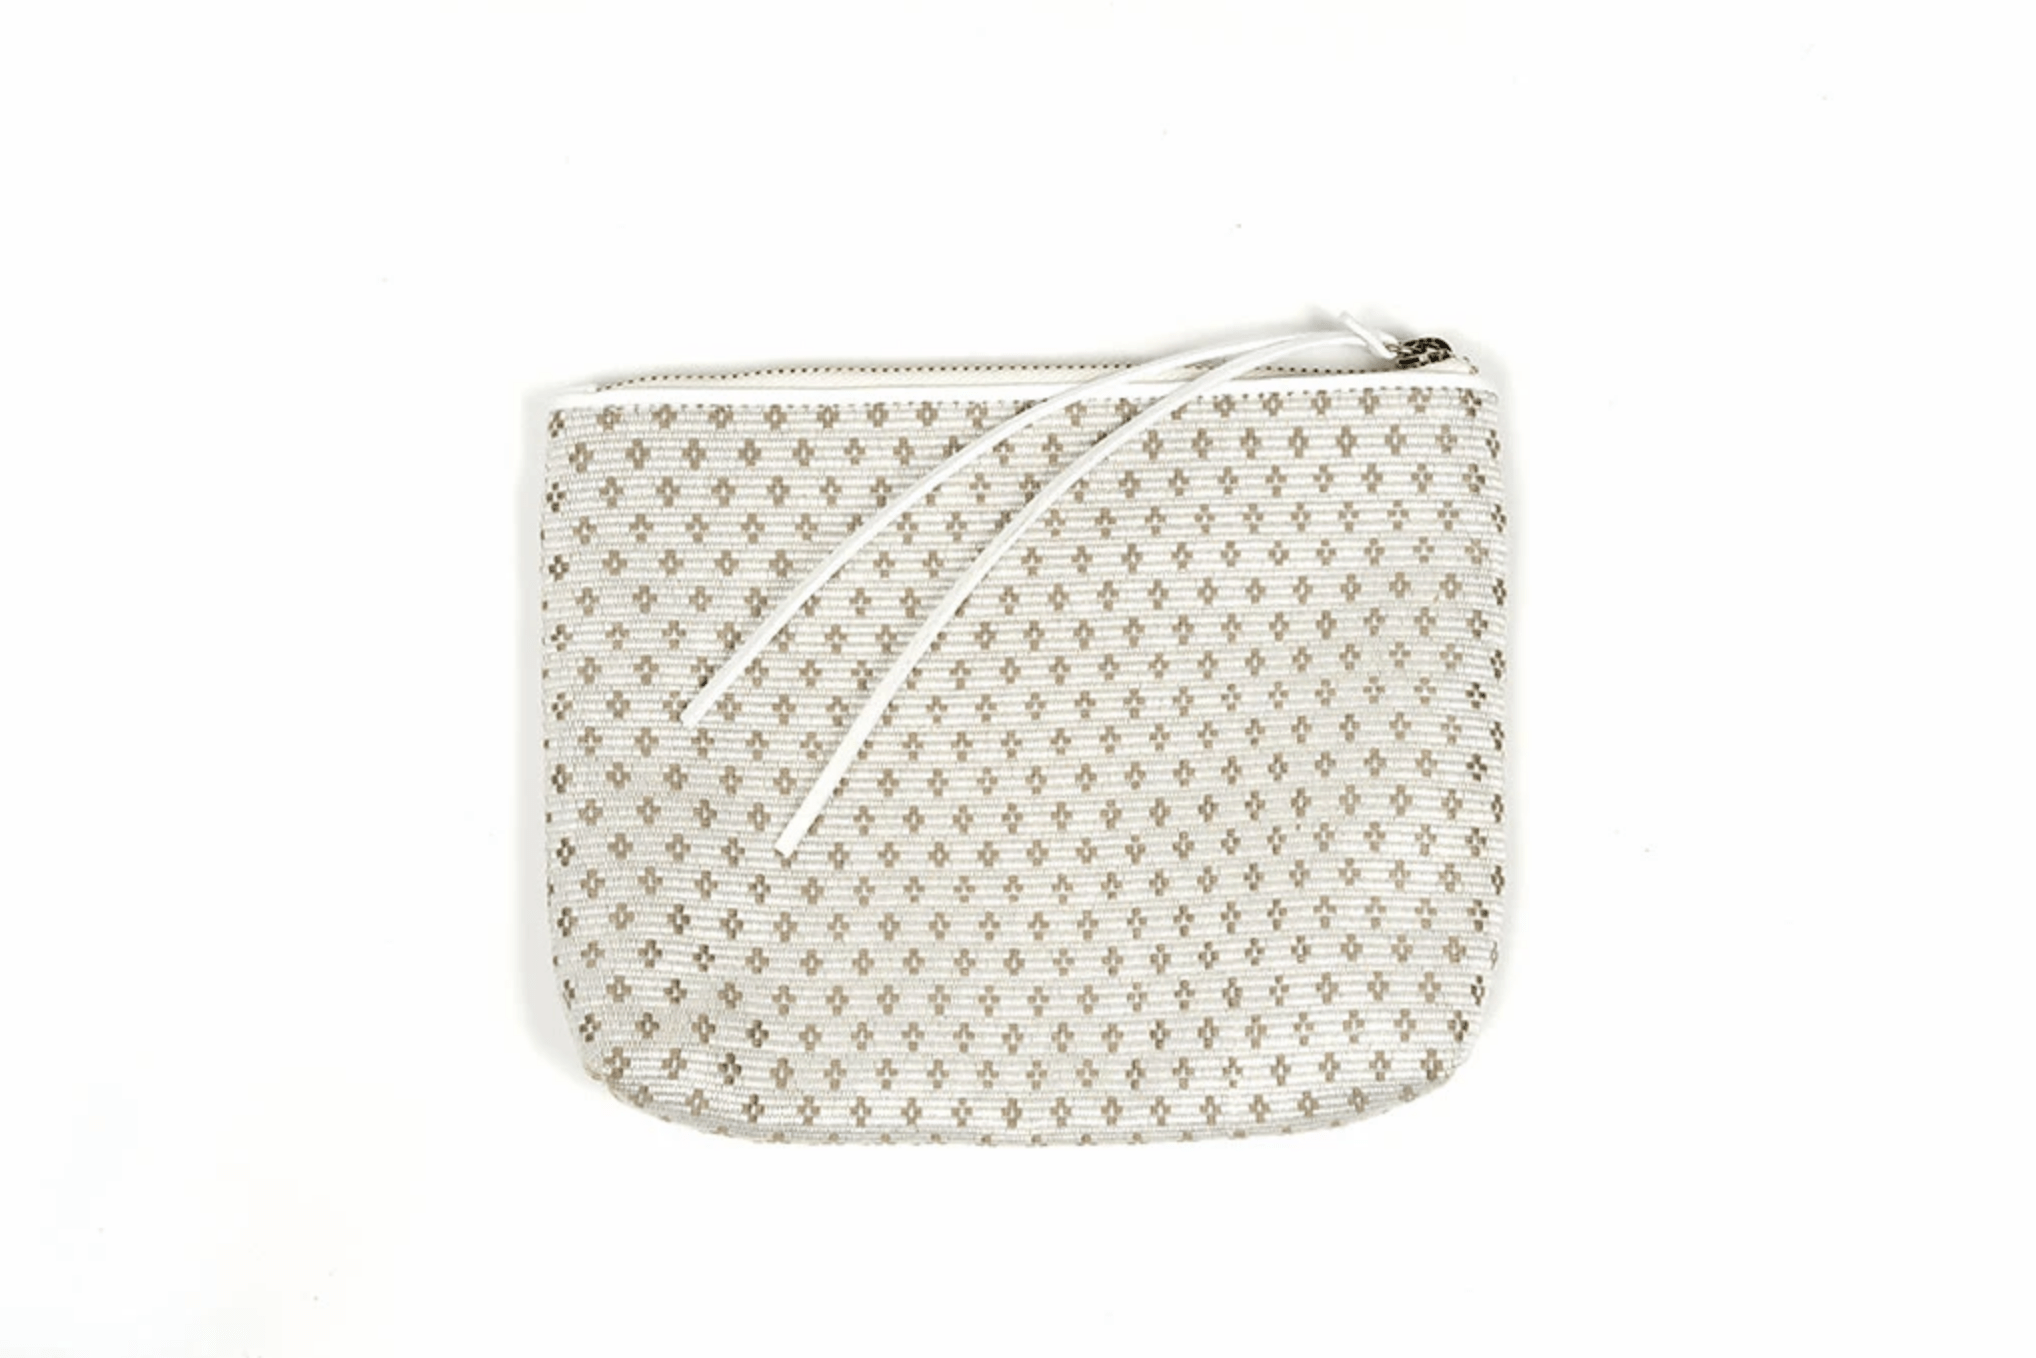 PBG-PARIS-Bags of Hope zipper pouch